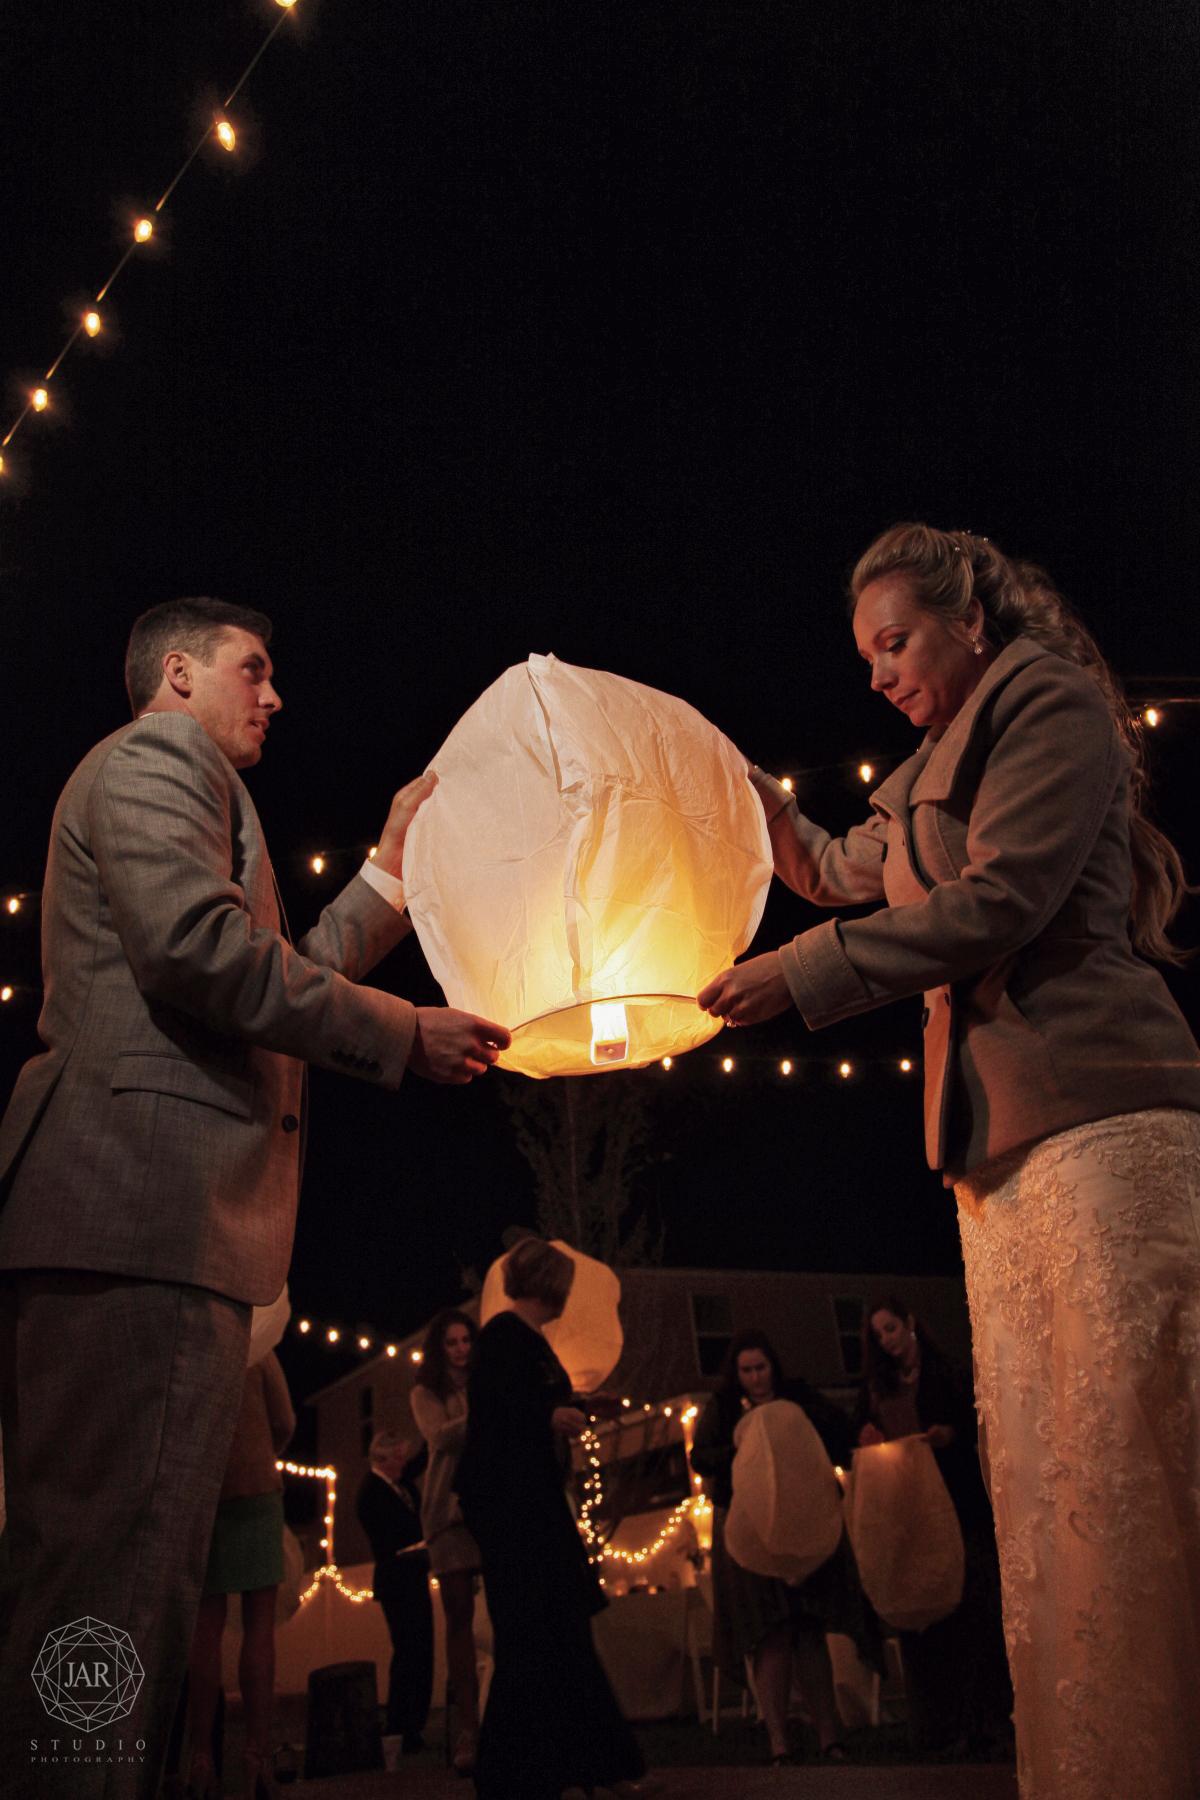 55-wedding-lanterns- rapunzel-jarstudio.JPG